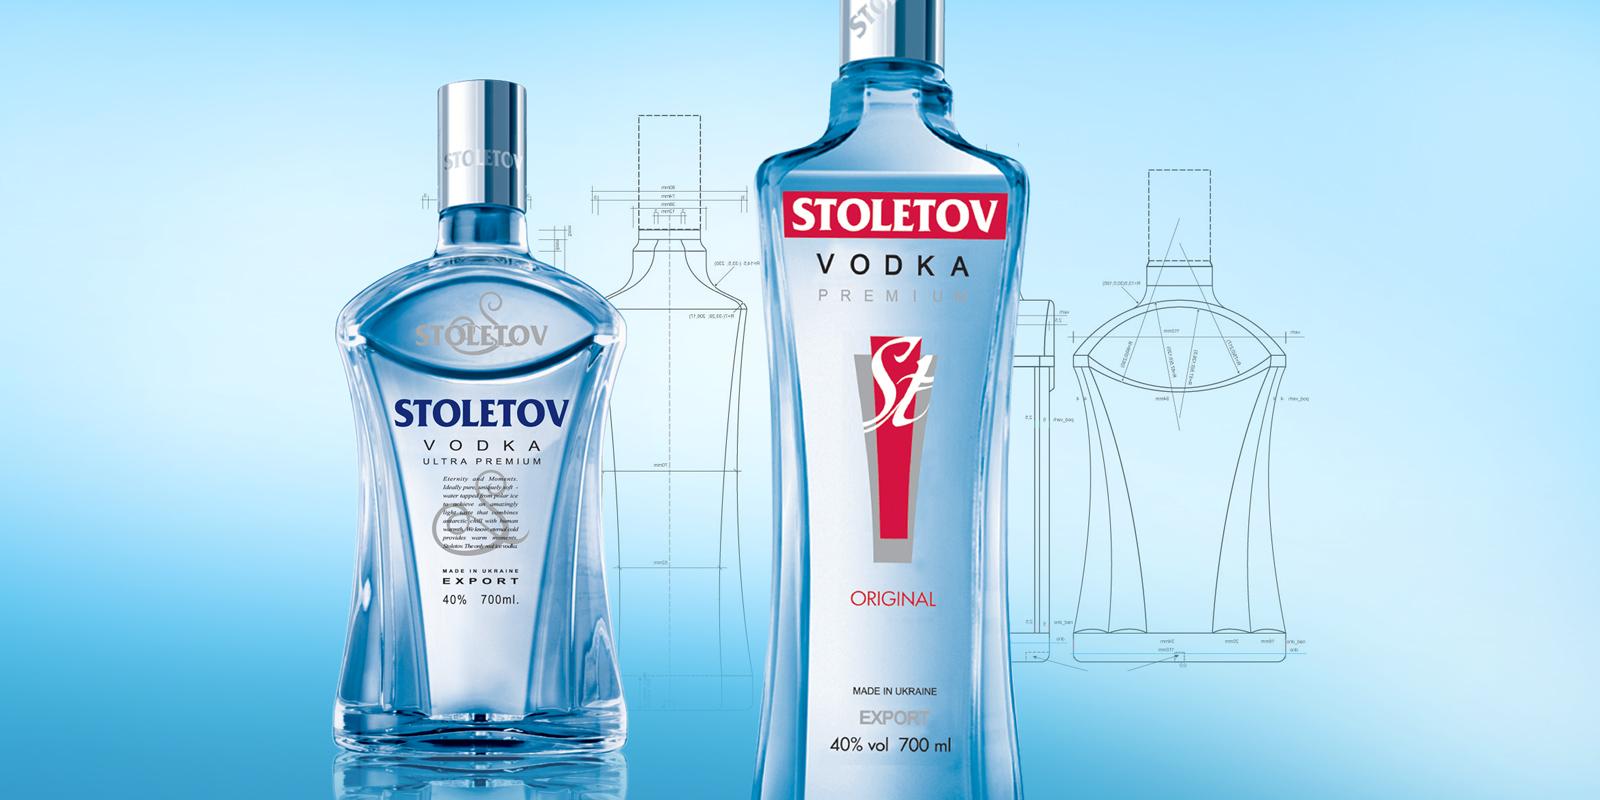 TM Stoletov;;;;;;Дизайн бутылок;;;;;;<span>Клиент:</span> Корпорация «Алеф»;;;;;;;;;;;;Дизайн бутылок;;;;;;7